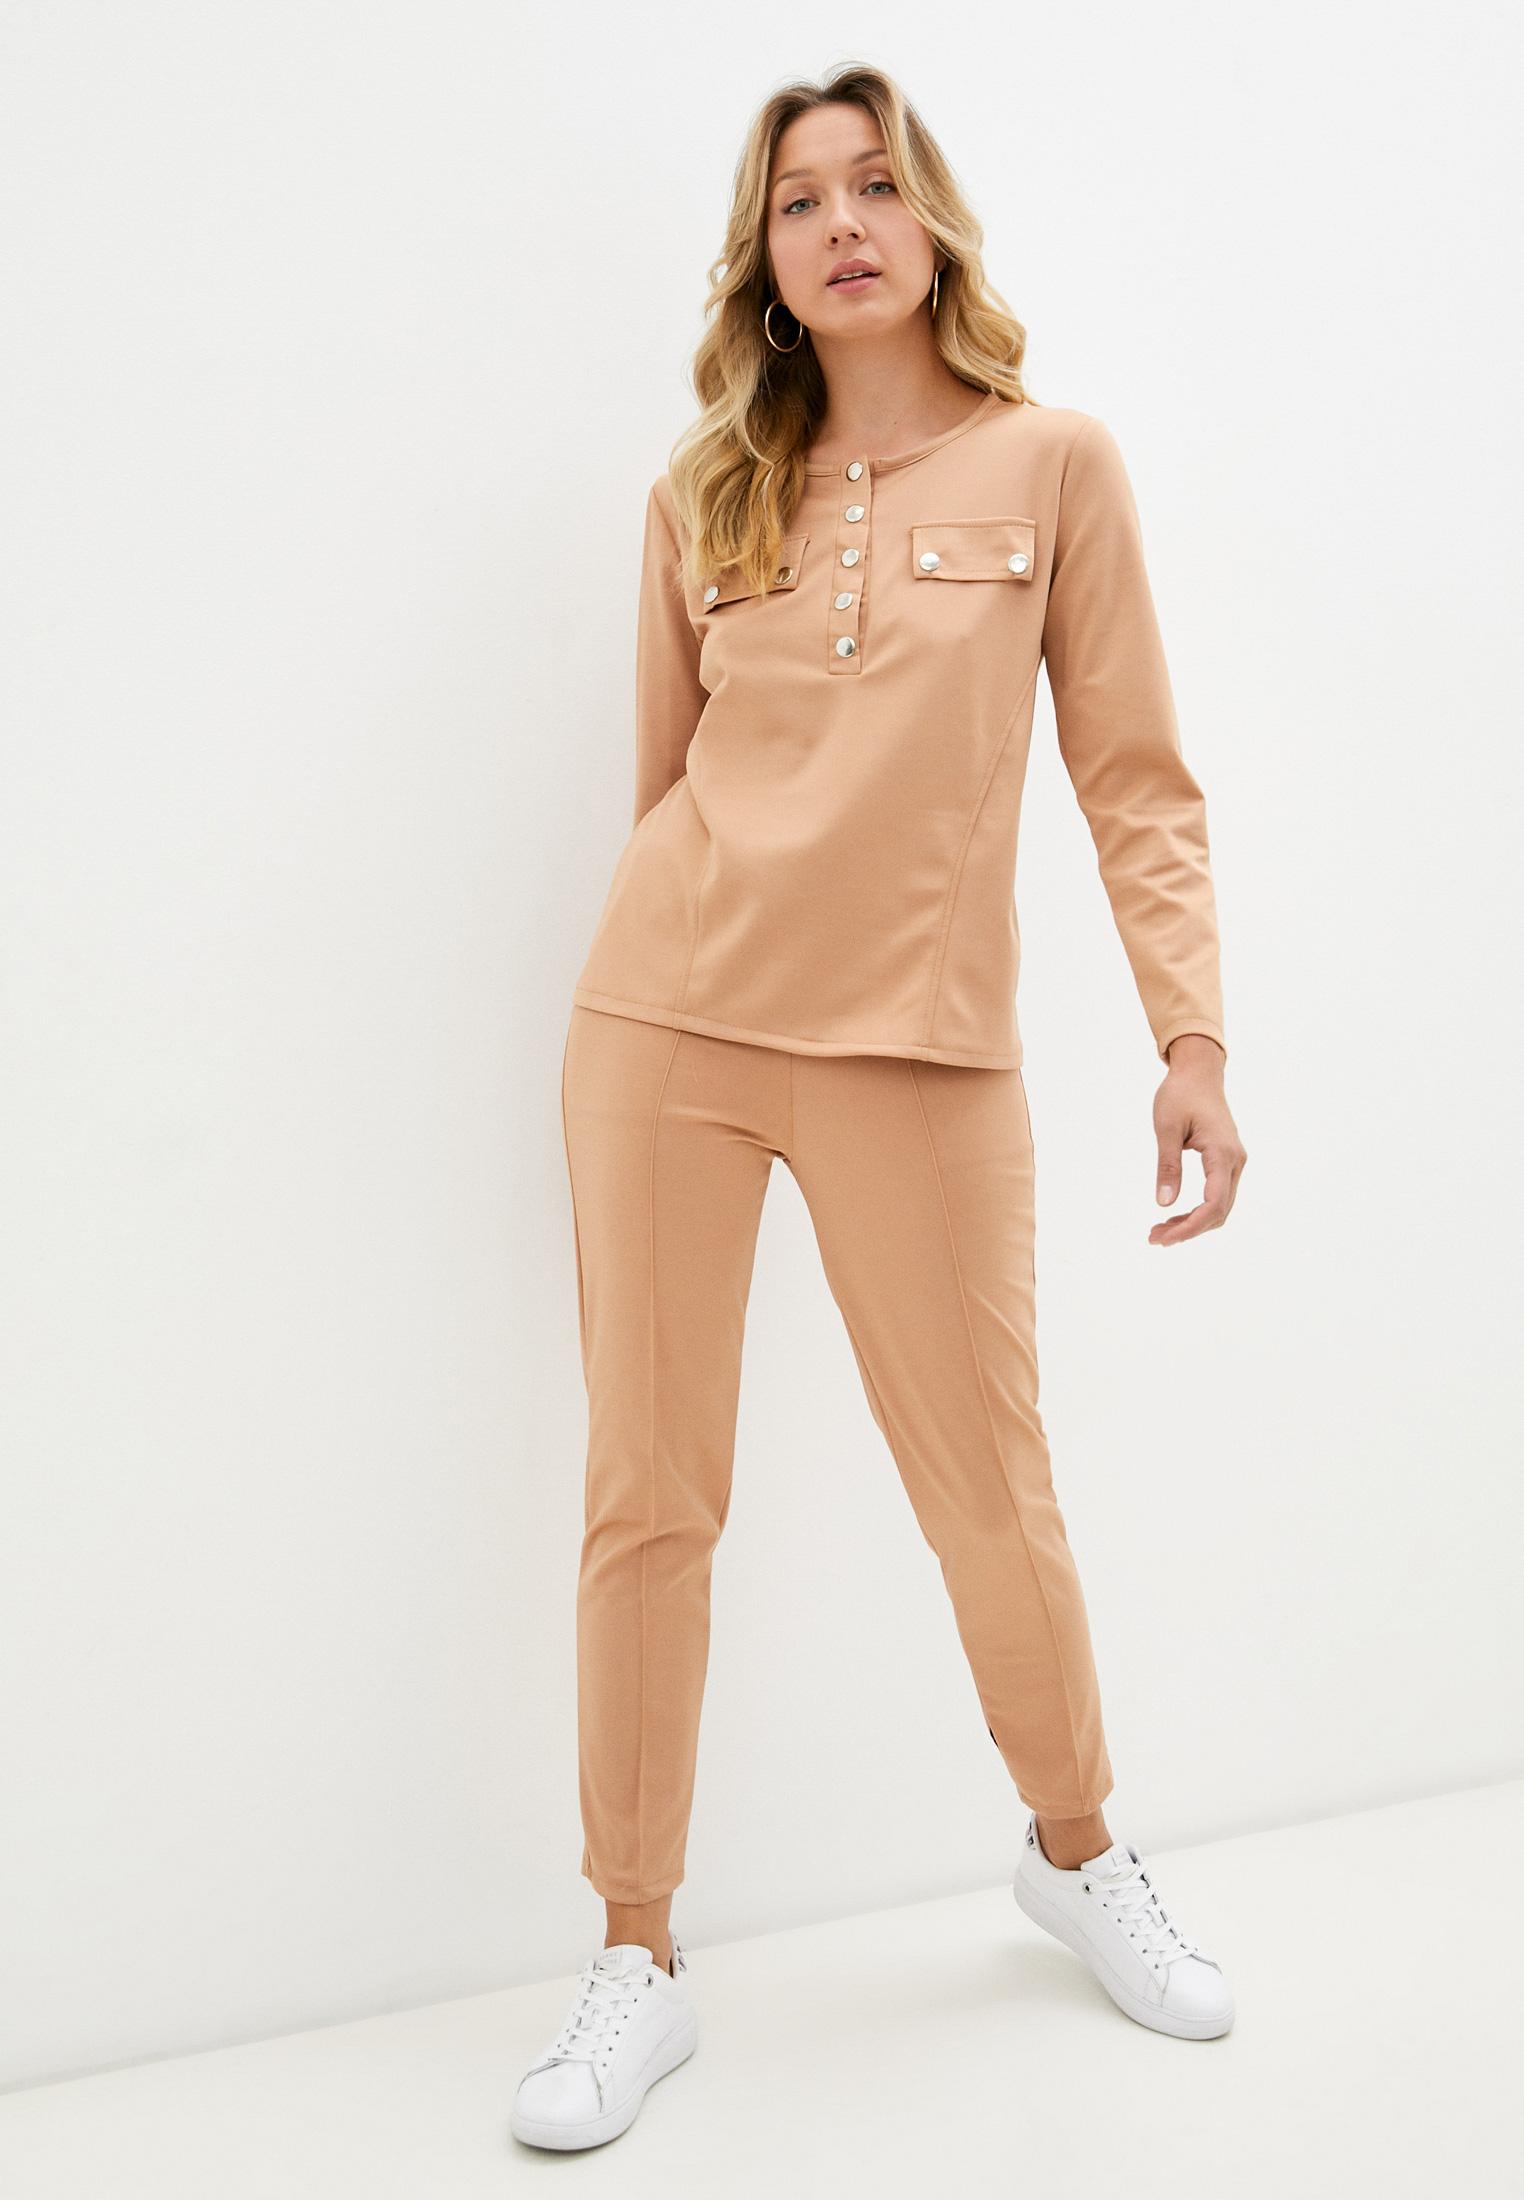 Костюм с брюками Pink Orange PO21-0313-2324-1